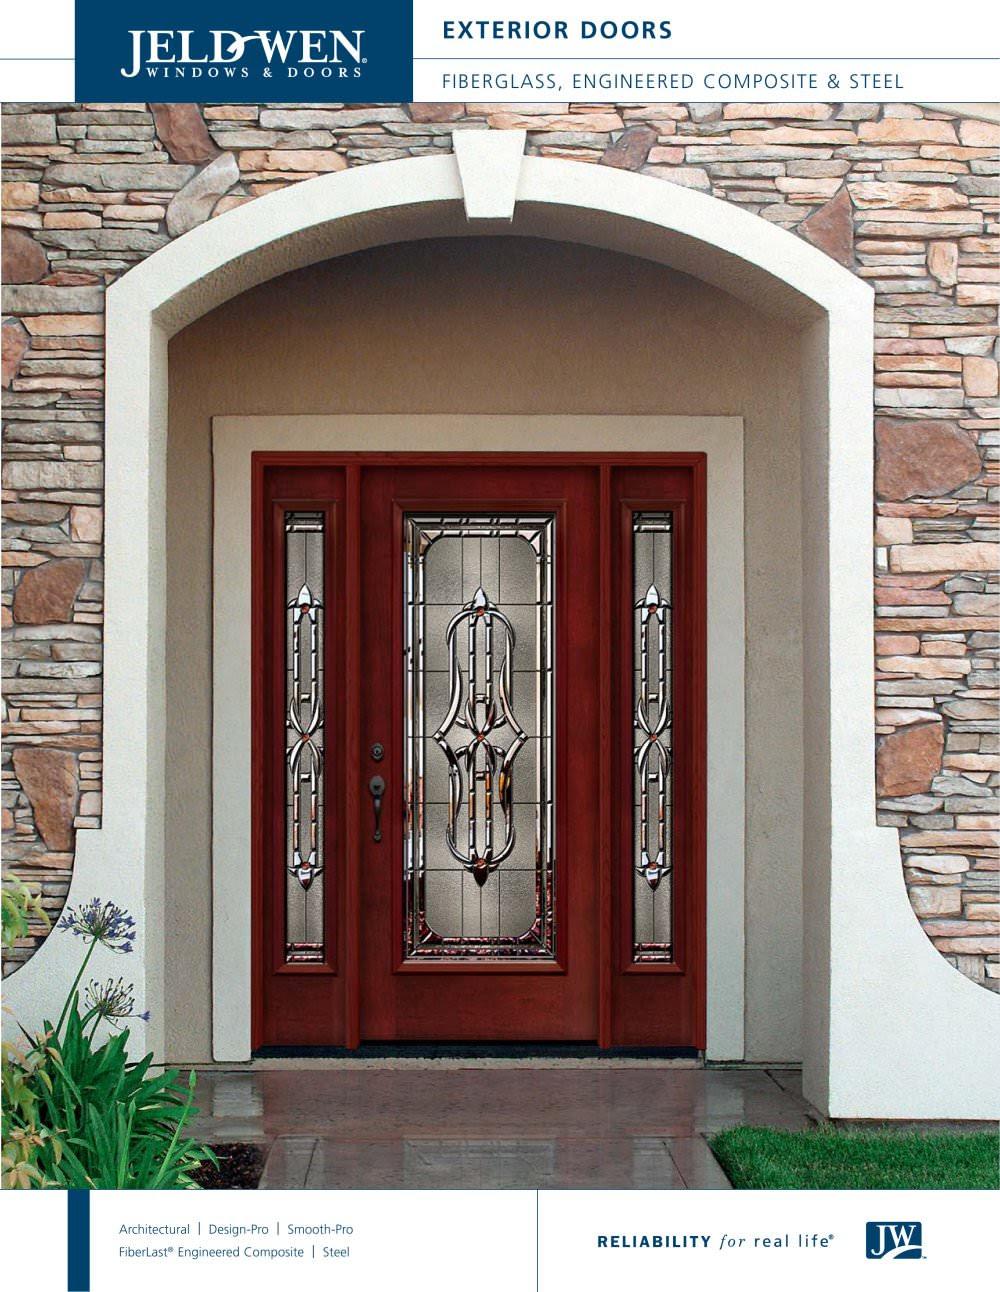 Fiberglass And Steel Exterior Doors Jeld Wen Pdf Catalogs